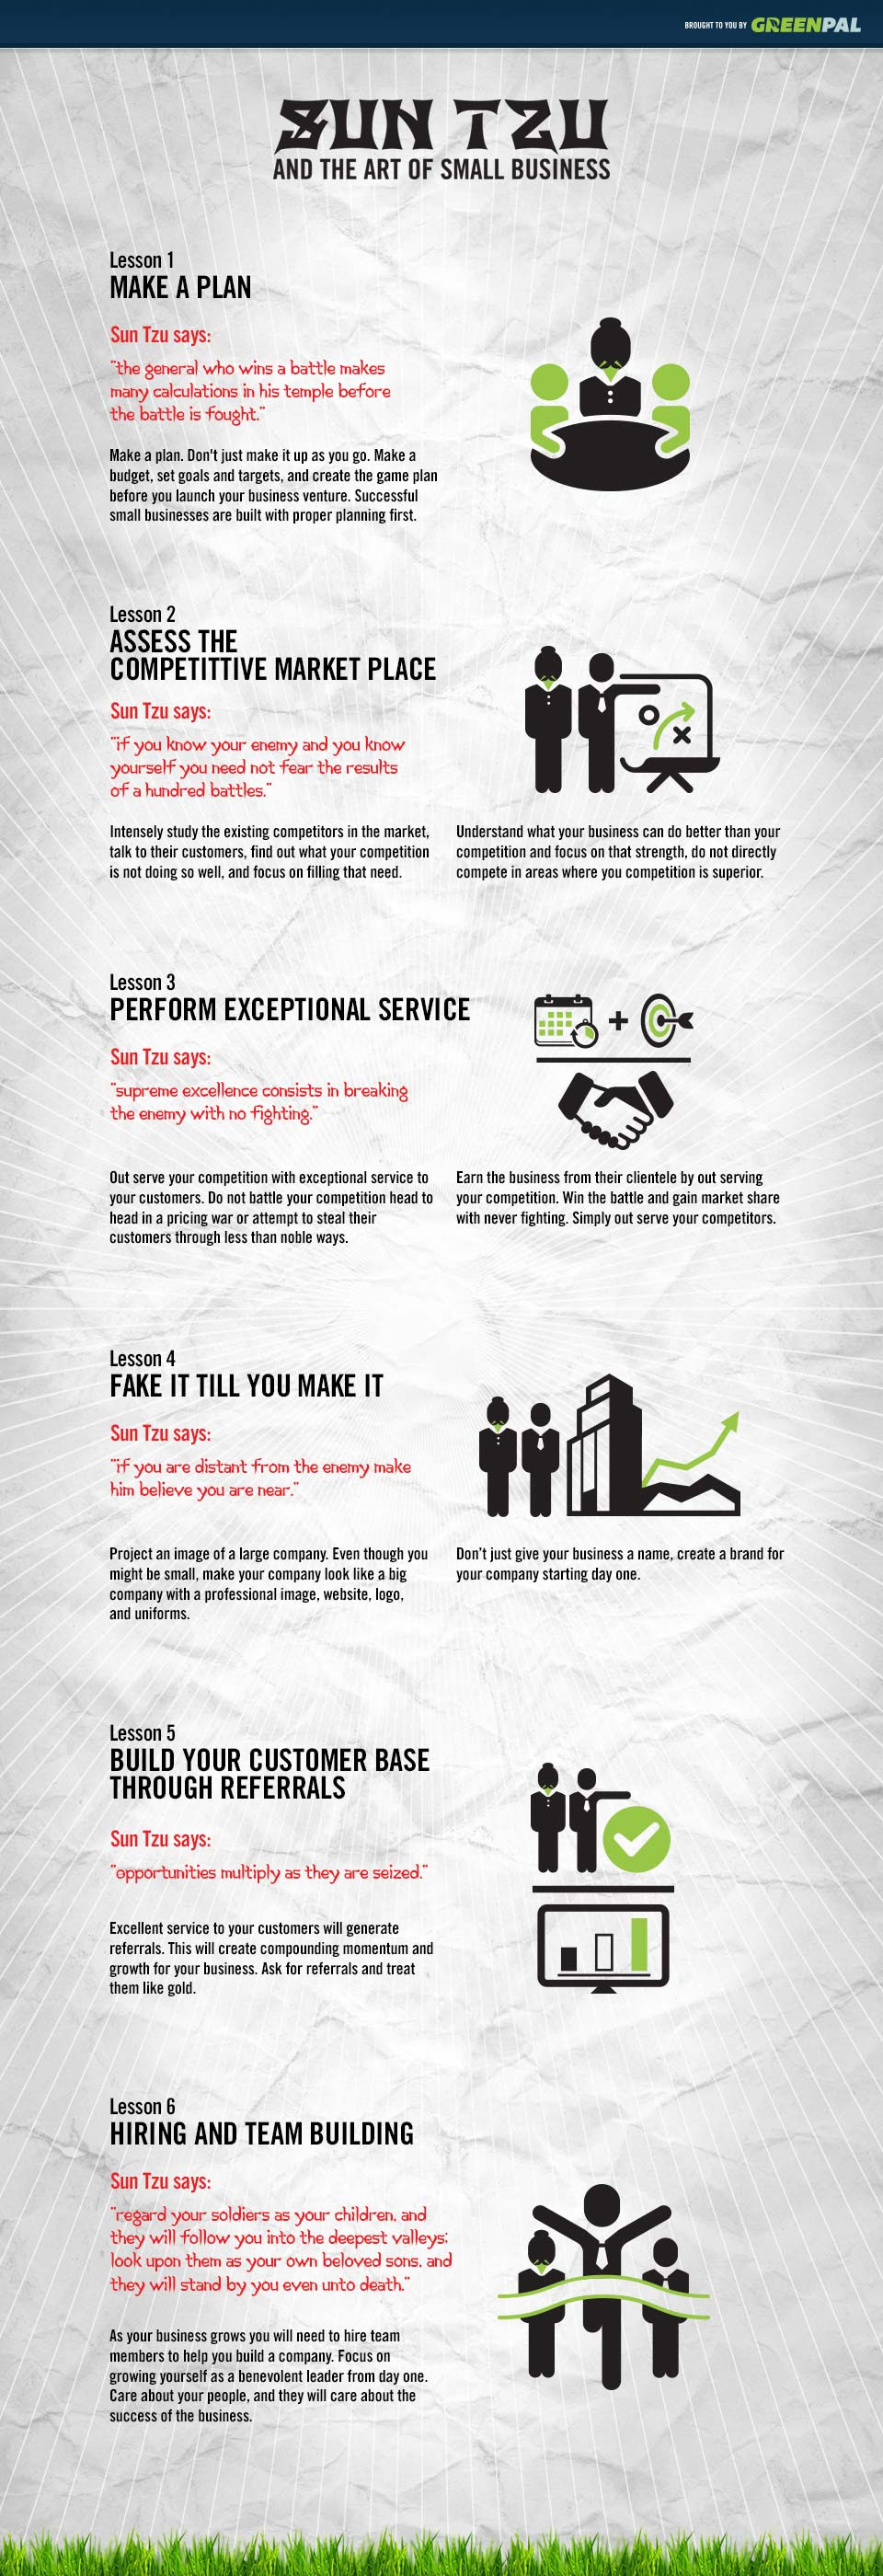 Sun Tzu and The Art of Business Strategy image SunTzu static